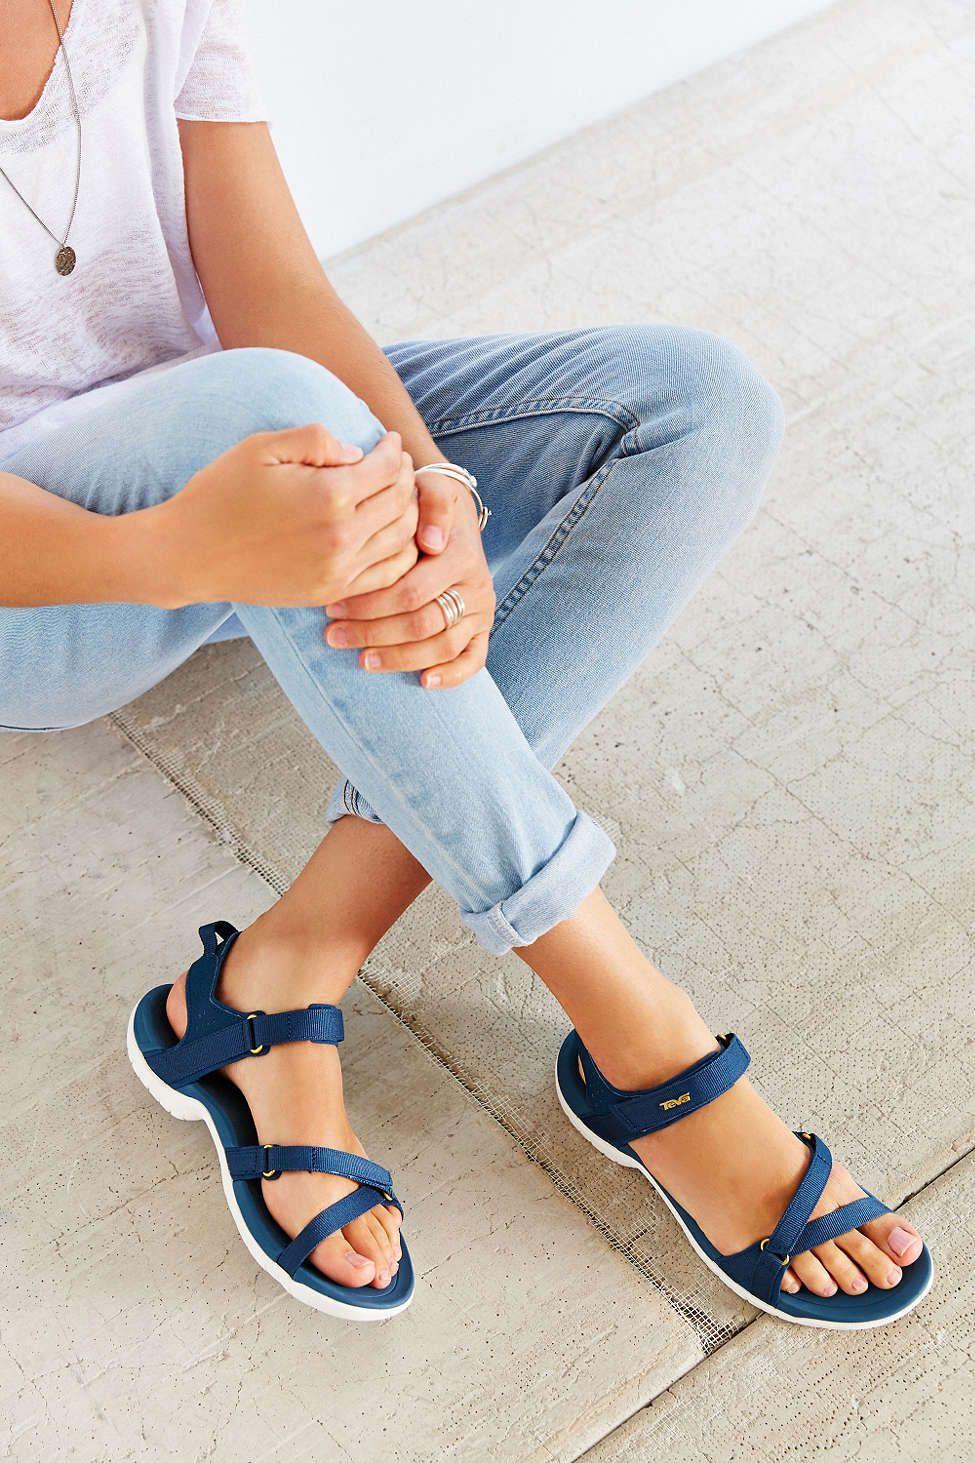 Teva Verra Sandal Urban Outfitters Sport Sandals Sandals Outfit Teva